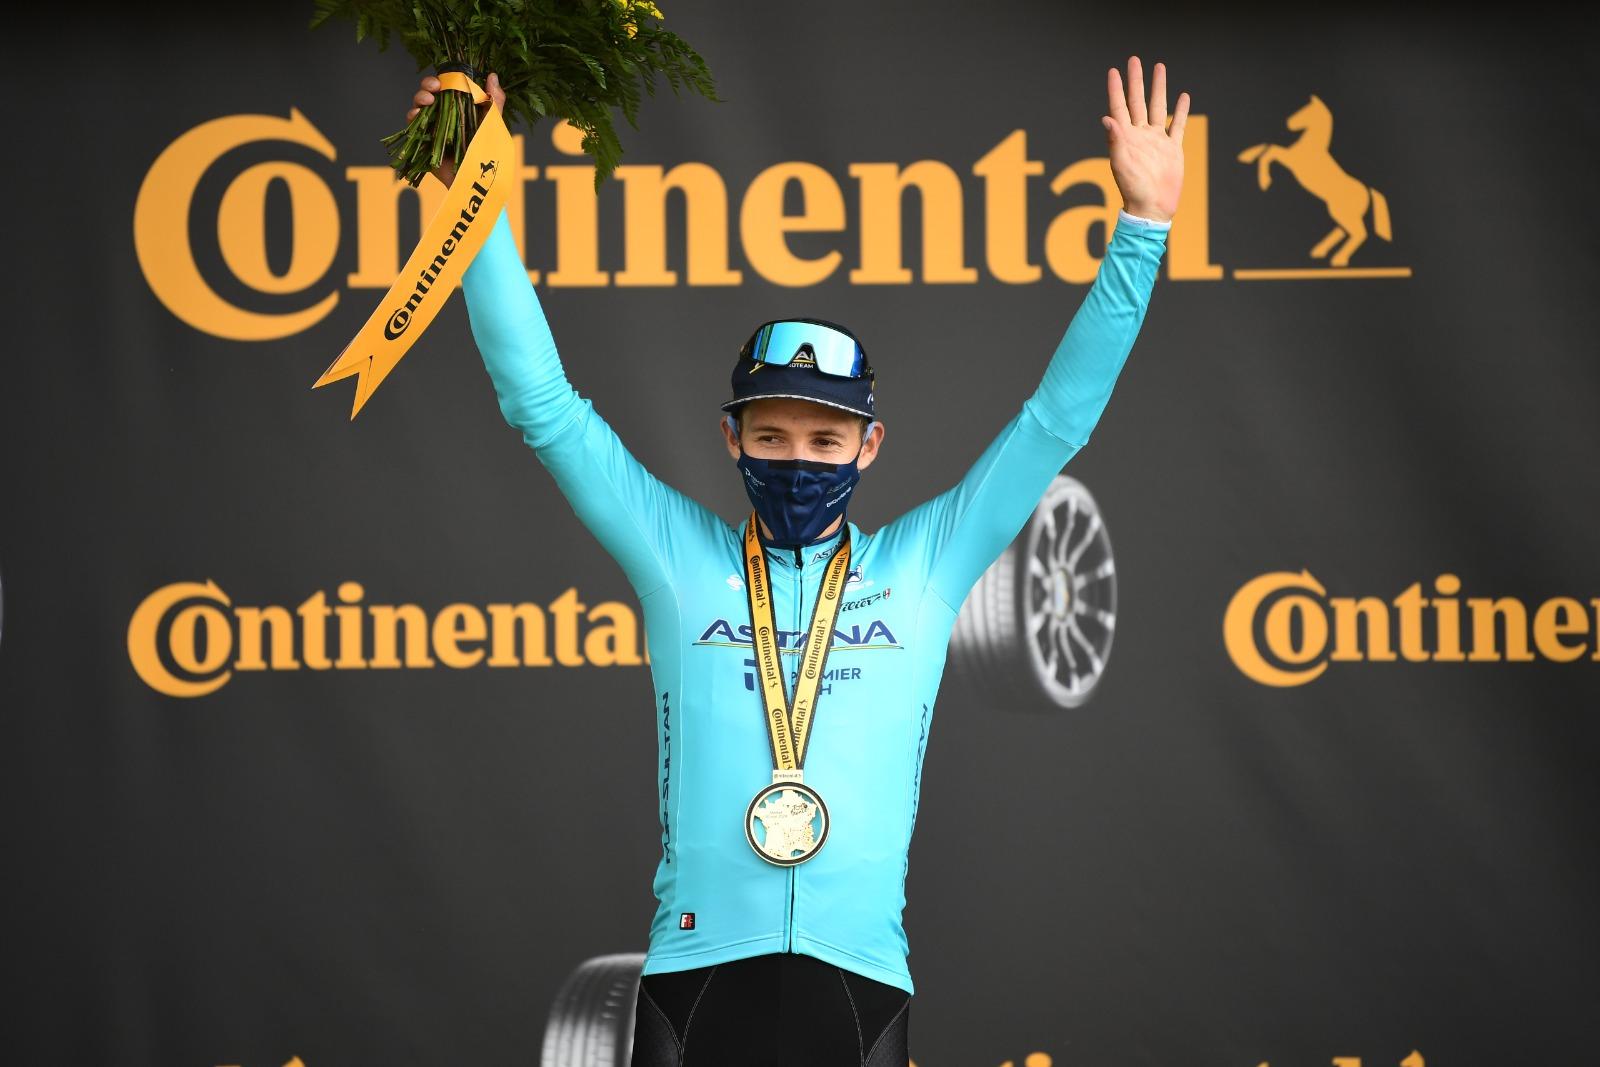 López dinero tras triunfo Tour de Francia 2020